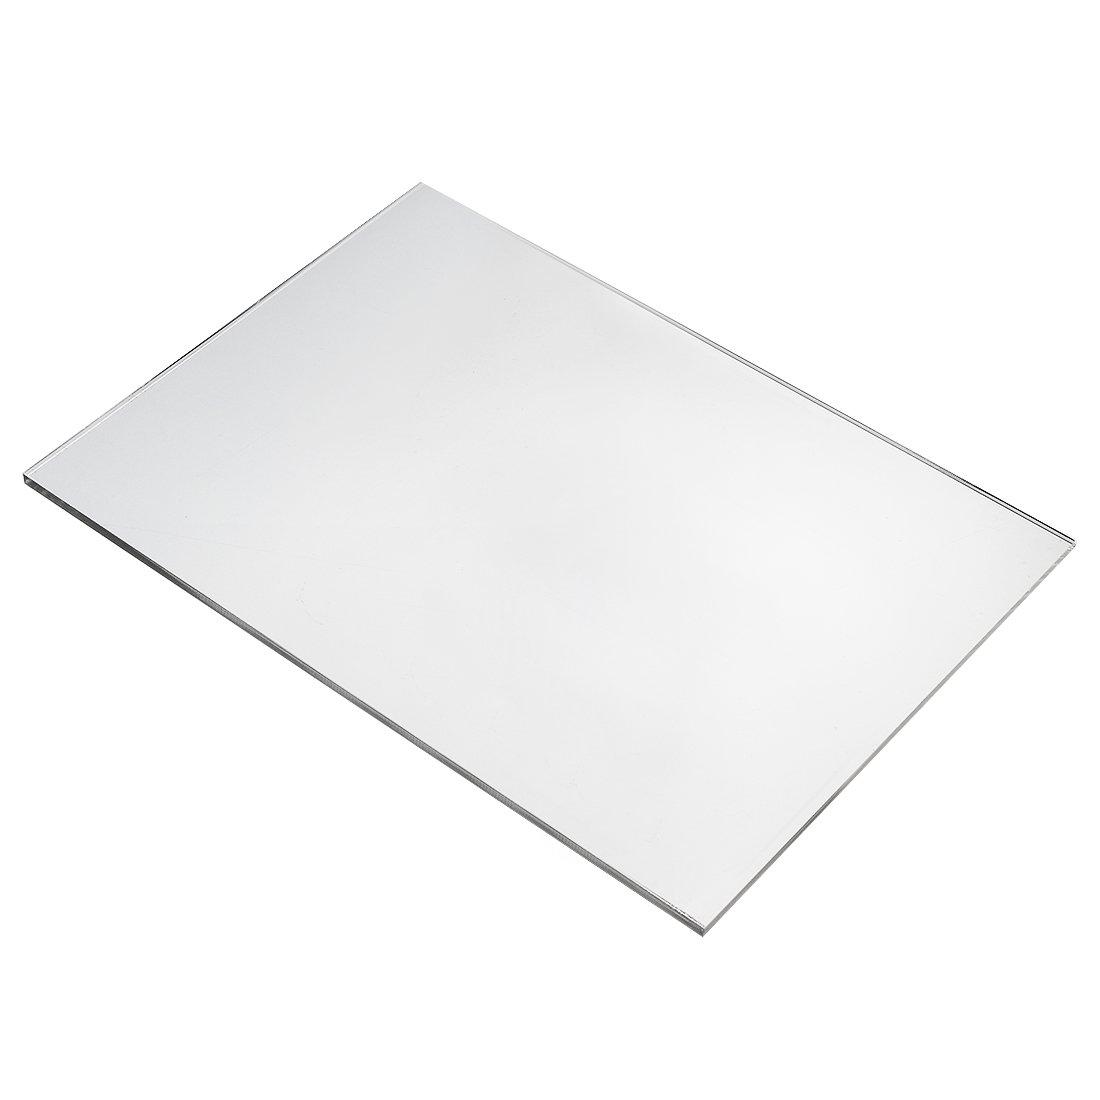 5mm Clear Perspex Acrylic Plexi Plastic sheet panel material A4 210mm x 297mm